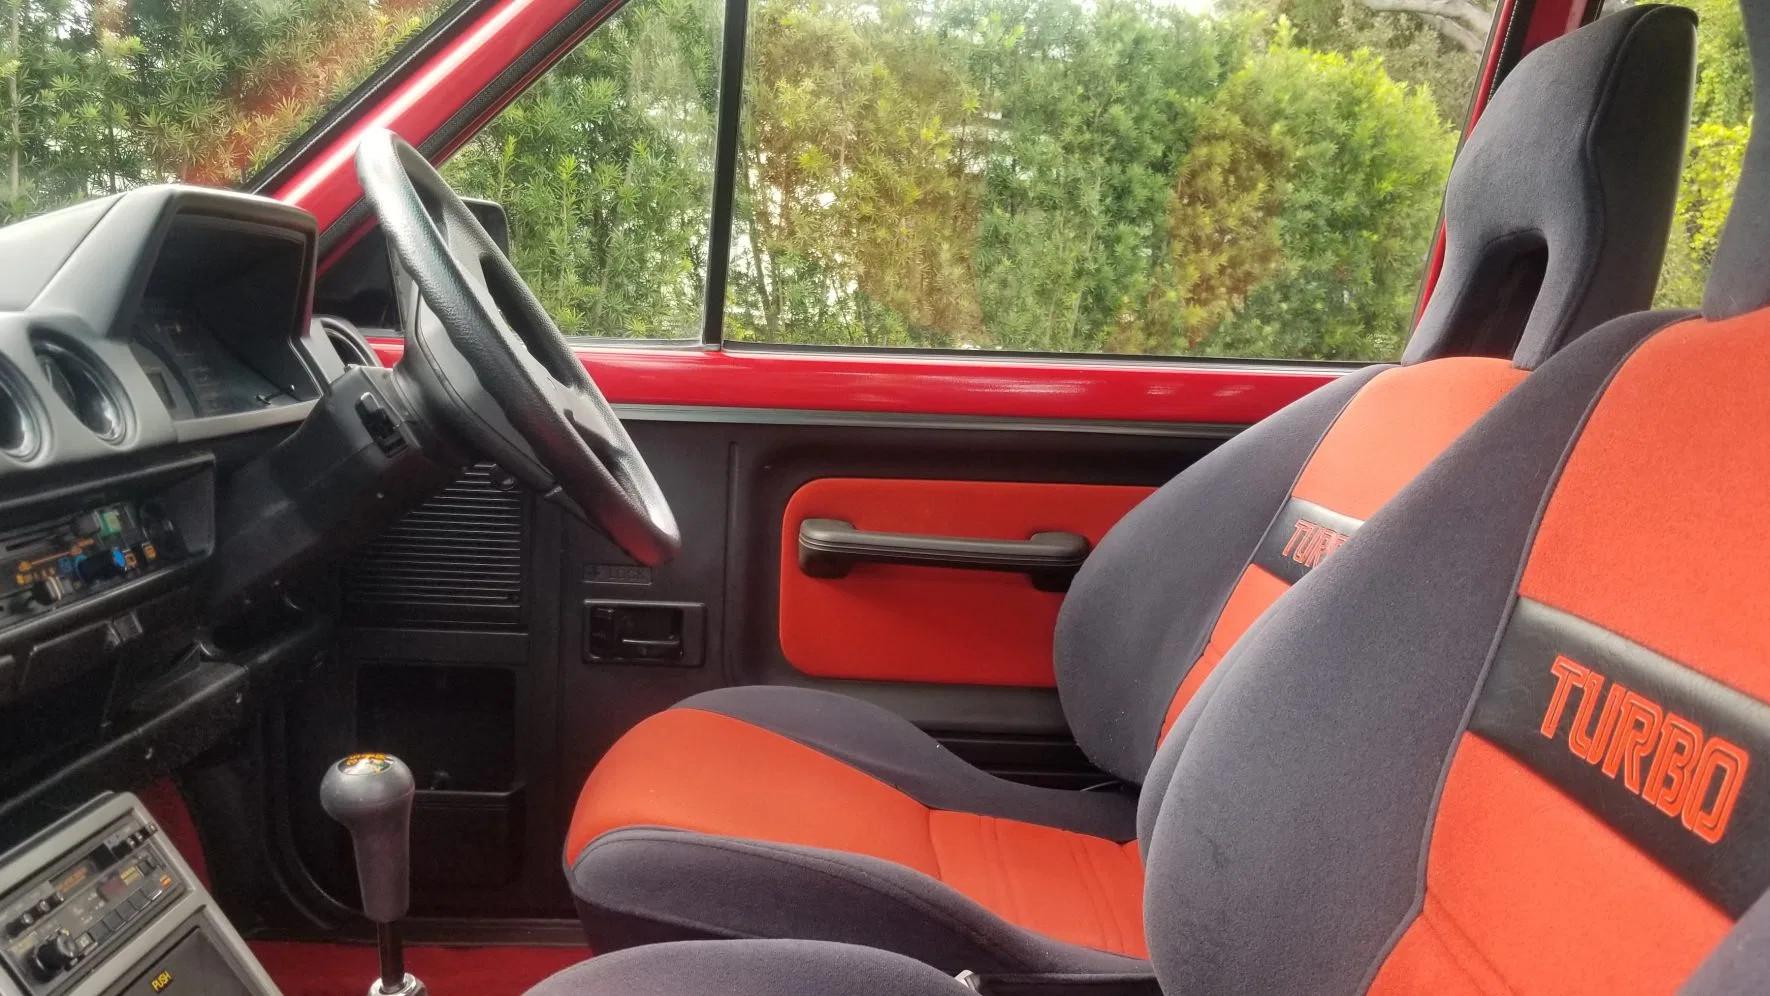 1983 Honda City Turbo dashboard